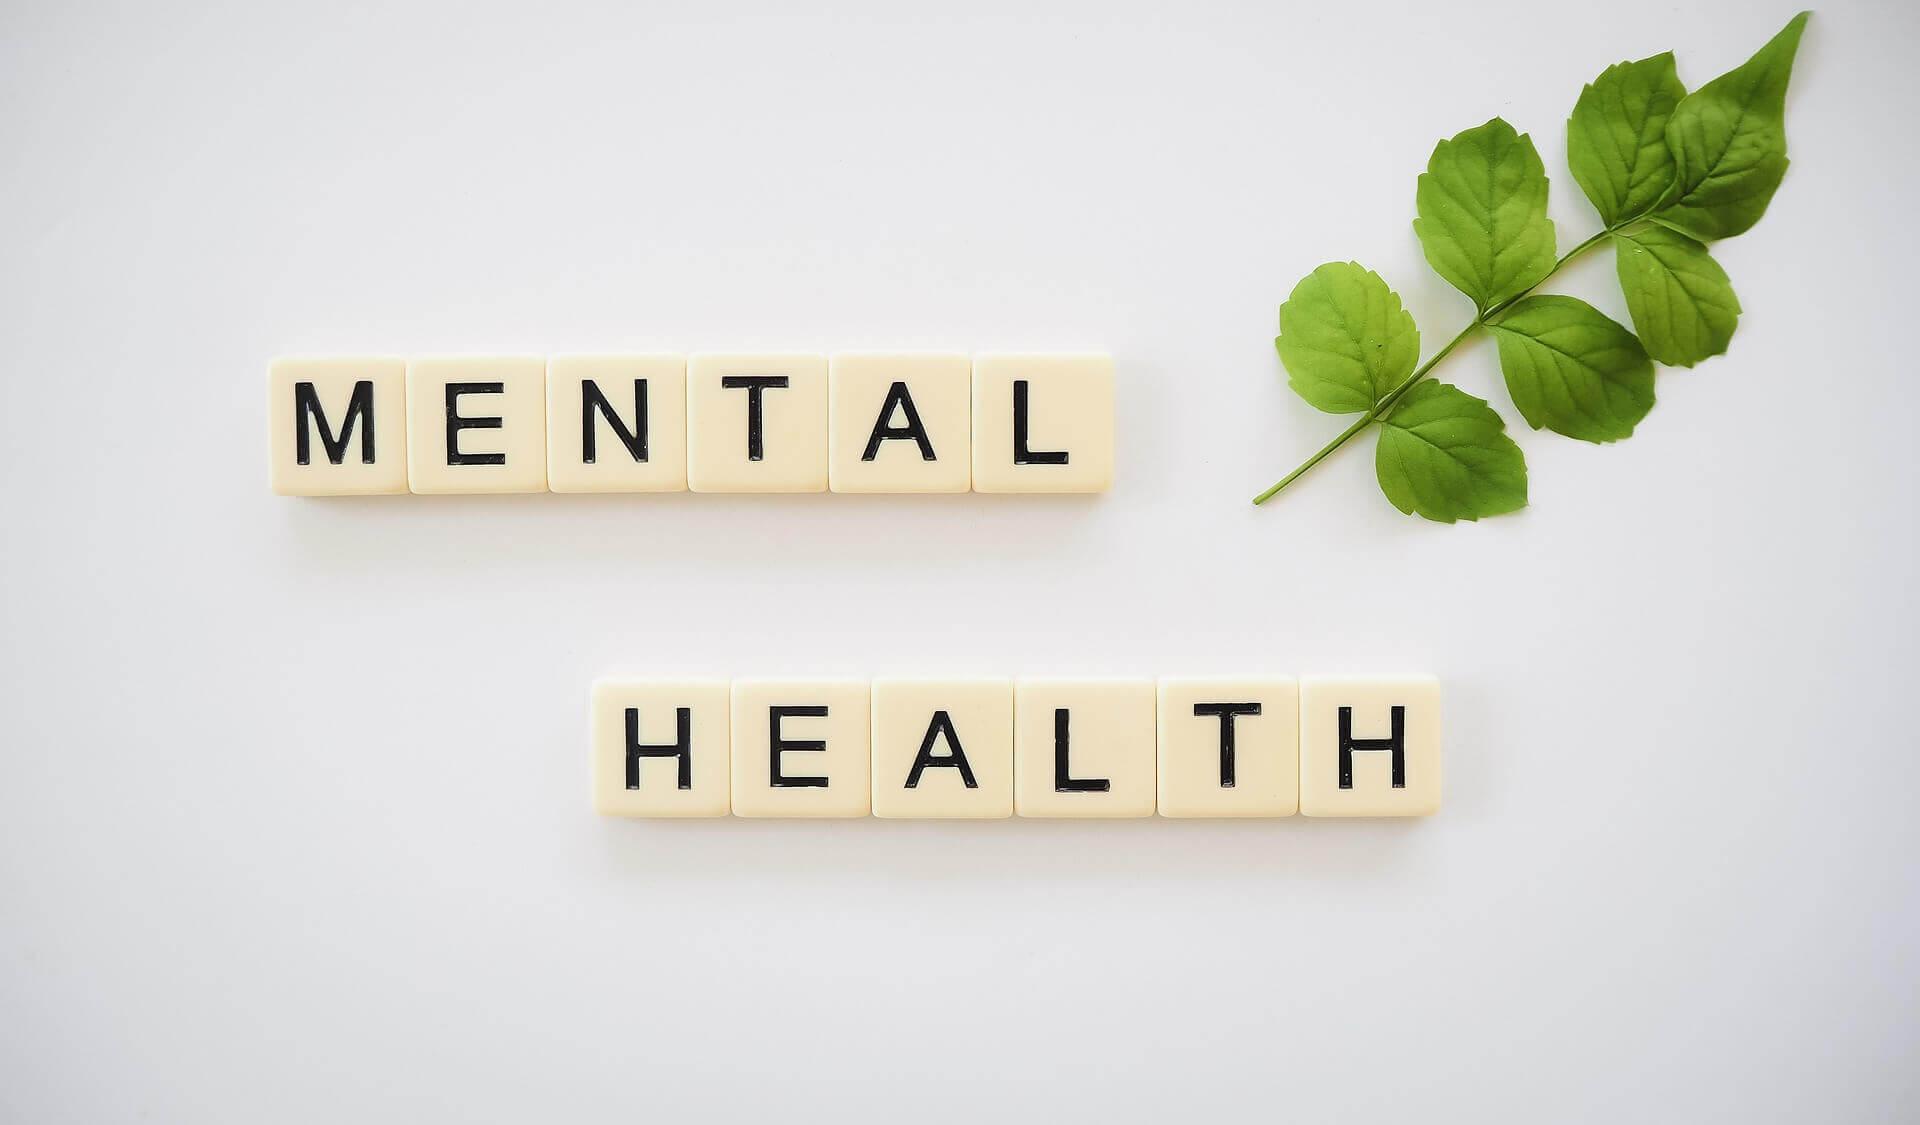 Mental Health – Don't Suffer Alone